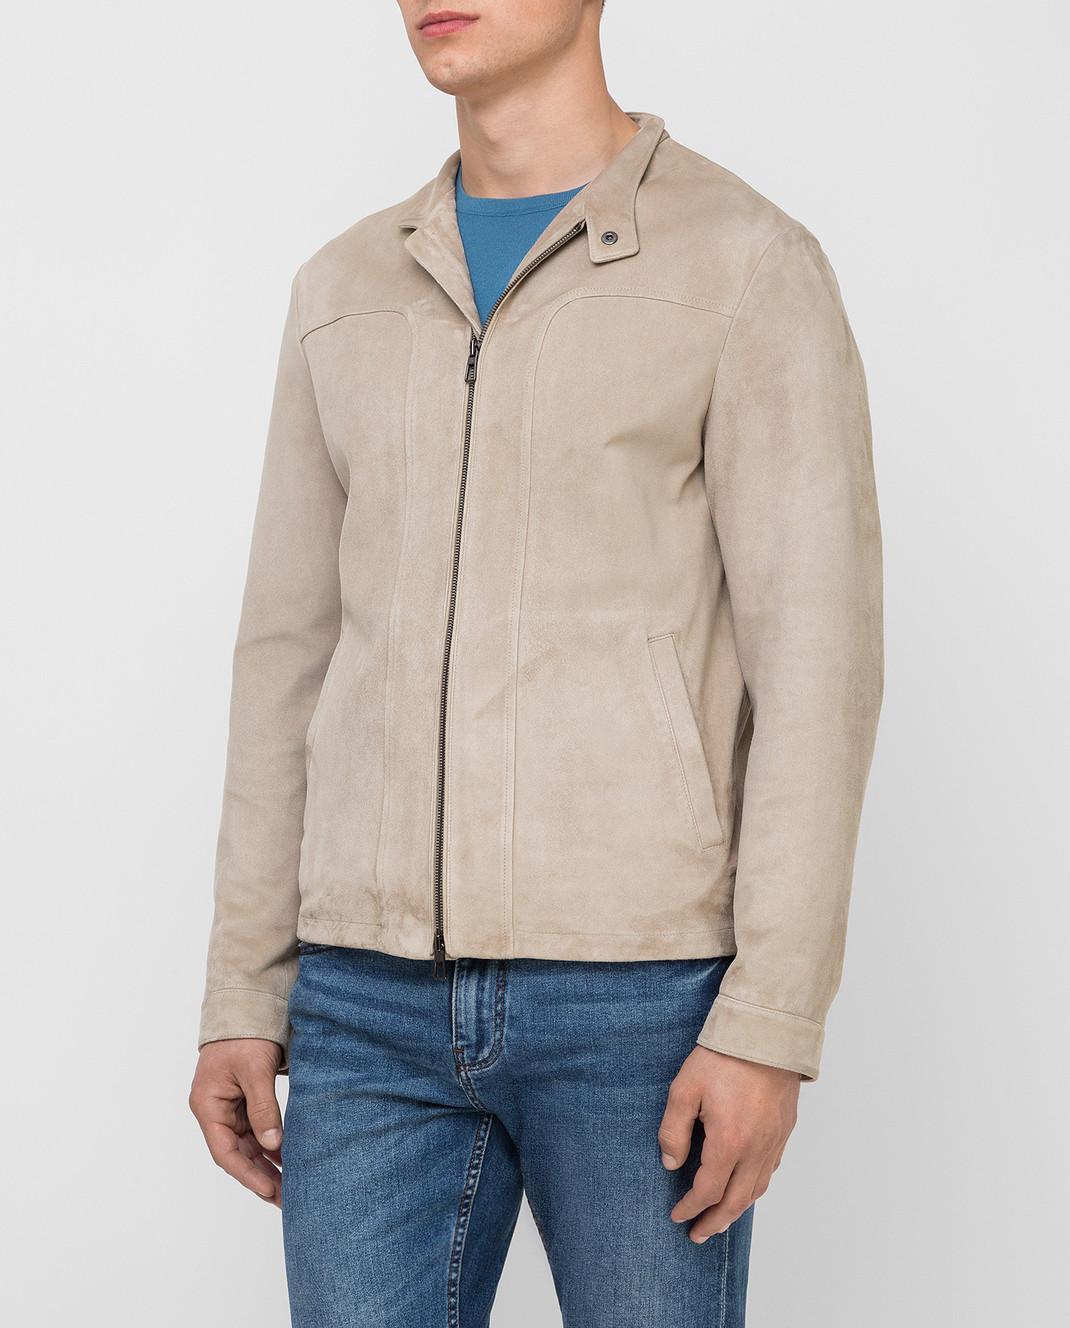 Loro Piana Светло-бежевая замшевая куртка F1FAG1790 изображение 3